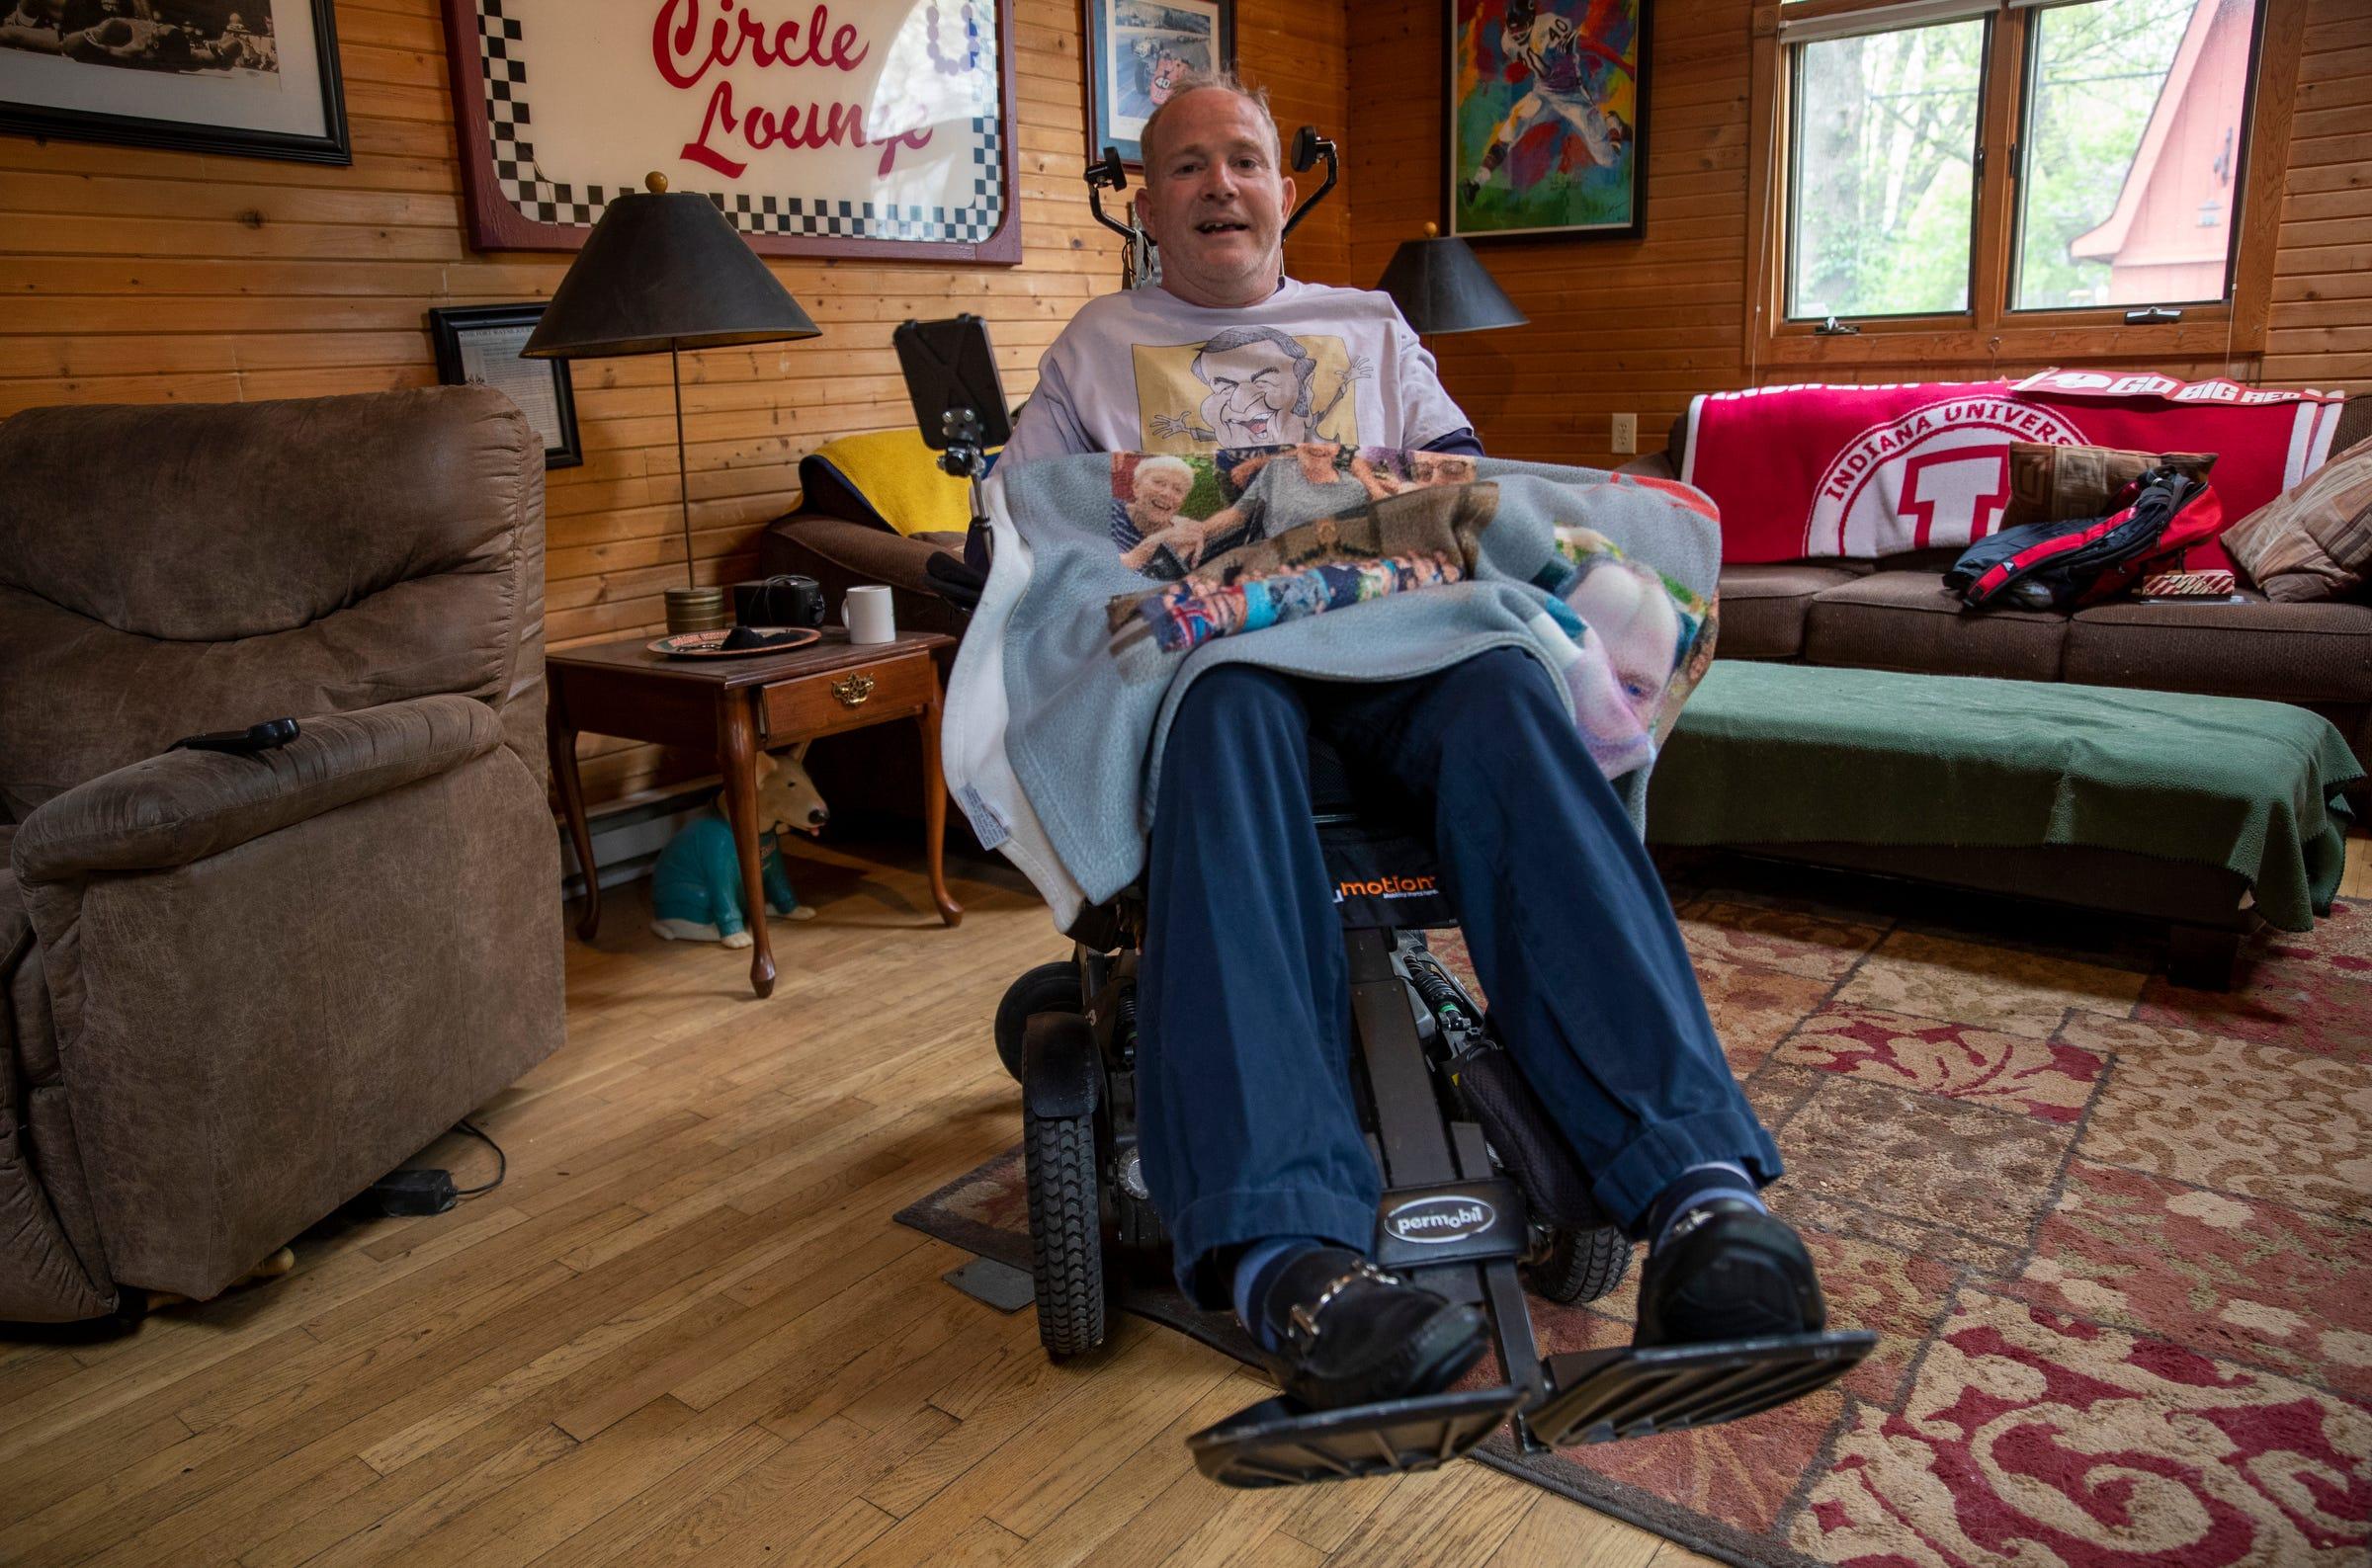 Man in hospice helped by Bobby 'Slick' Leonard